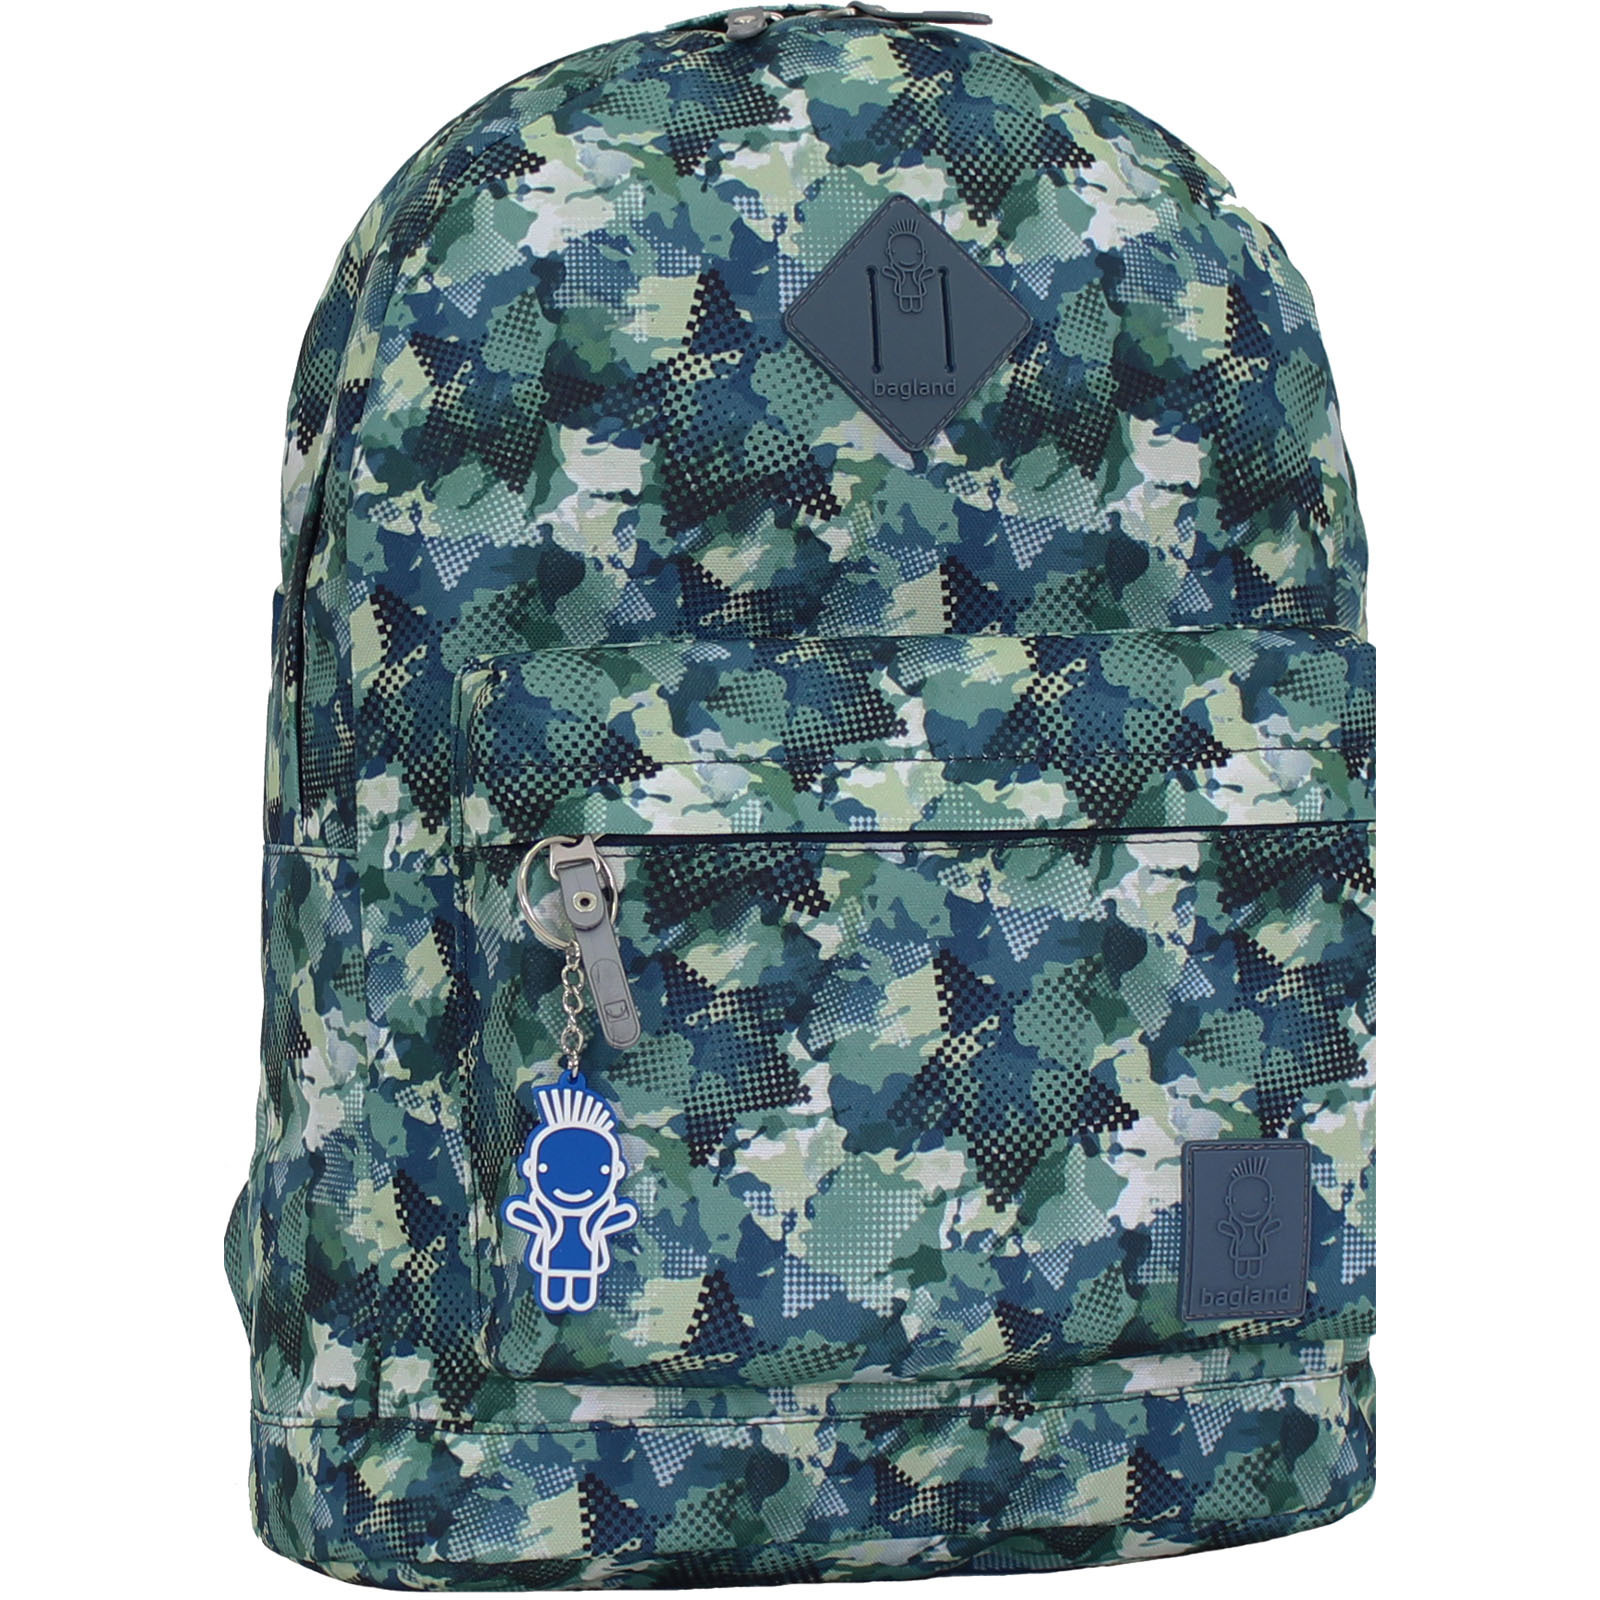 Городские рюкзаки Рюкзак Bagland Молодежный (дизайн) 17 л. сублимация 197 (00533664) IMG_1076_197.JPG